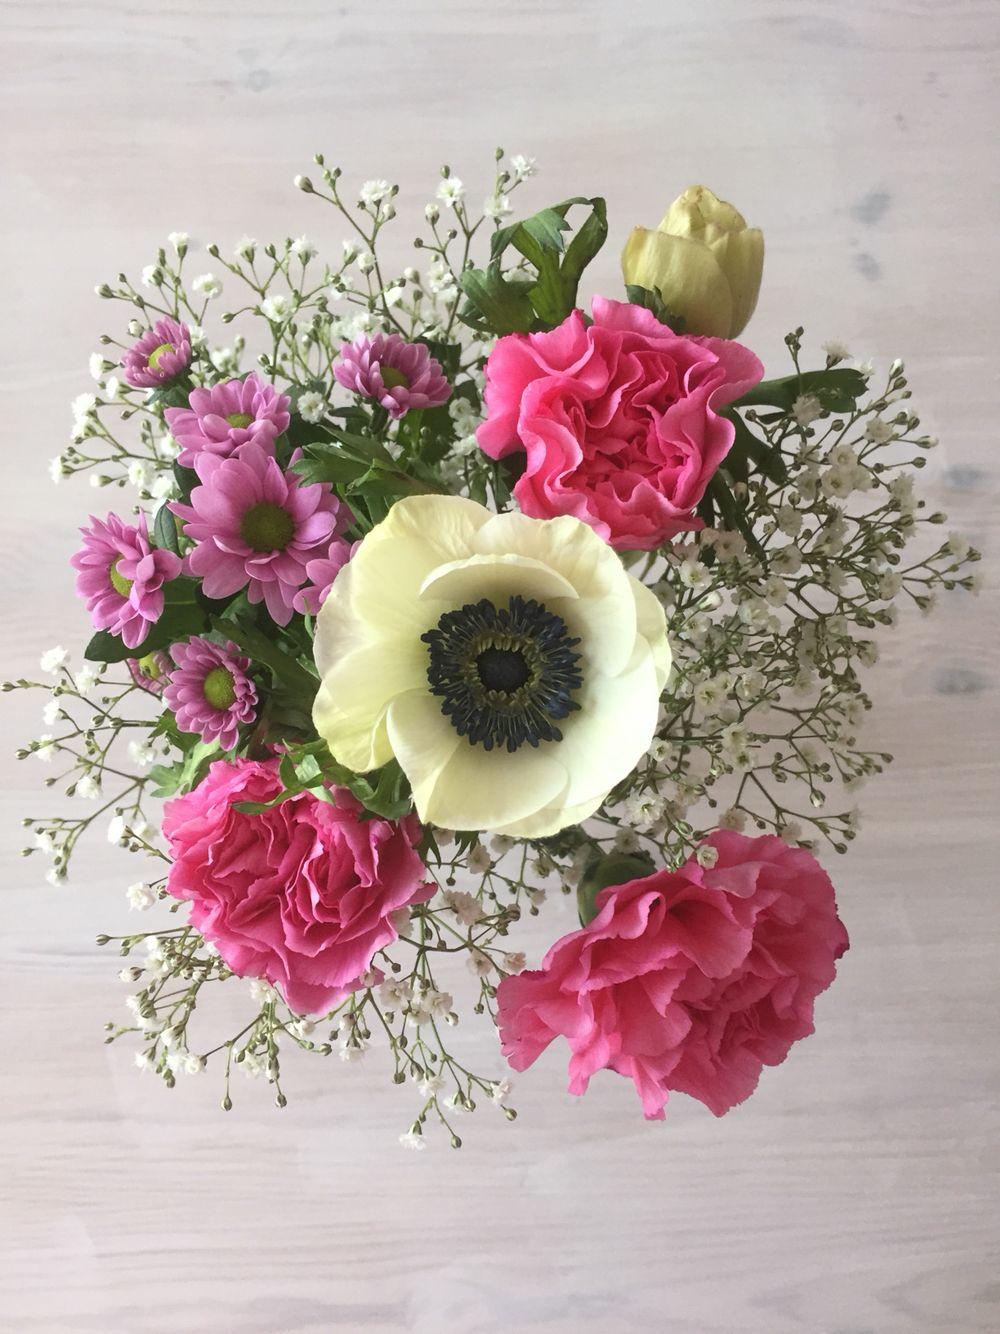 Spring flowers flowers pinterest spring flowers and flowers